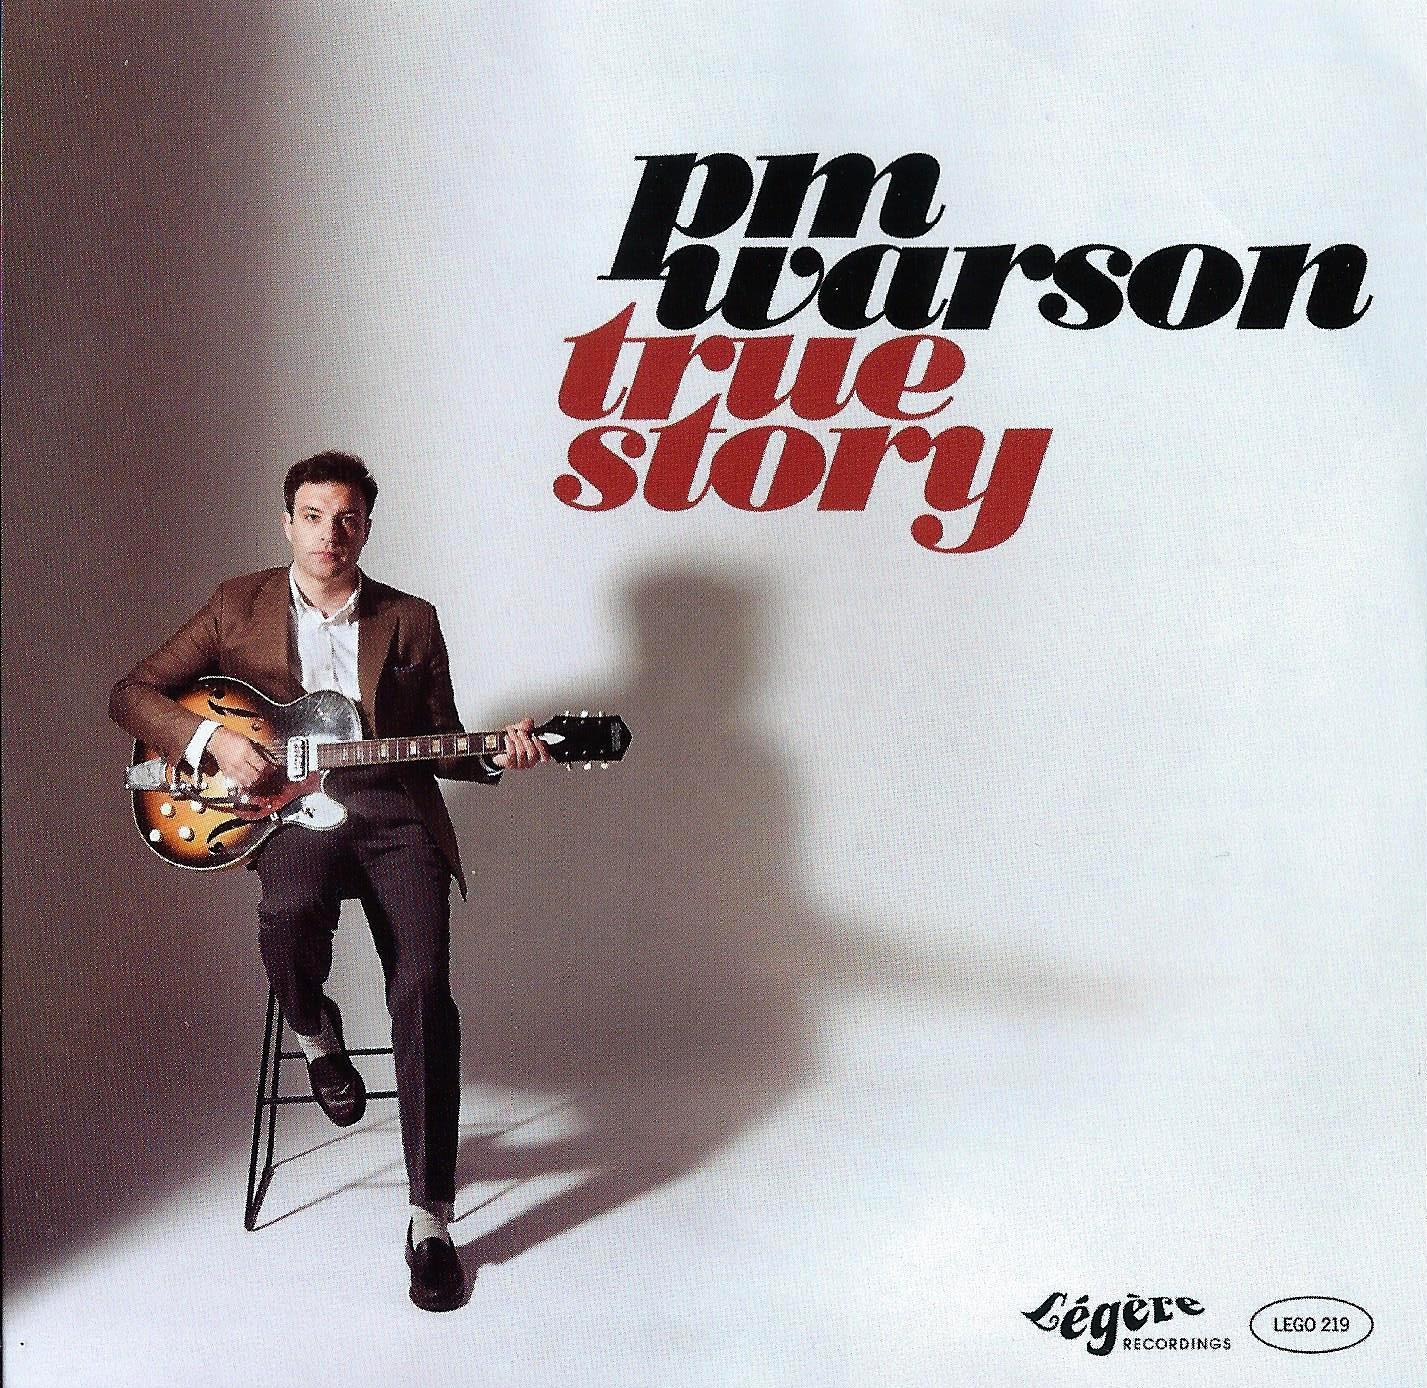 PM WARSON - True Story